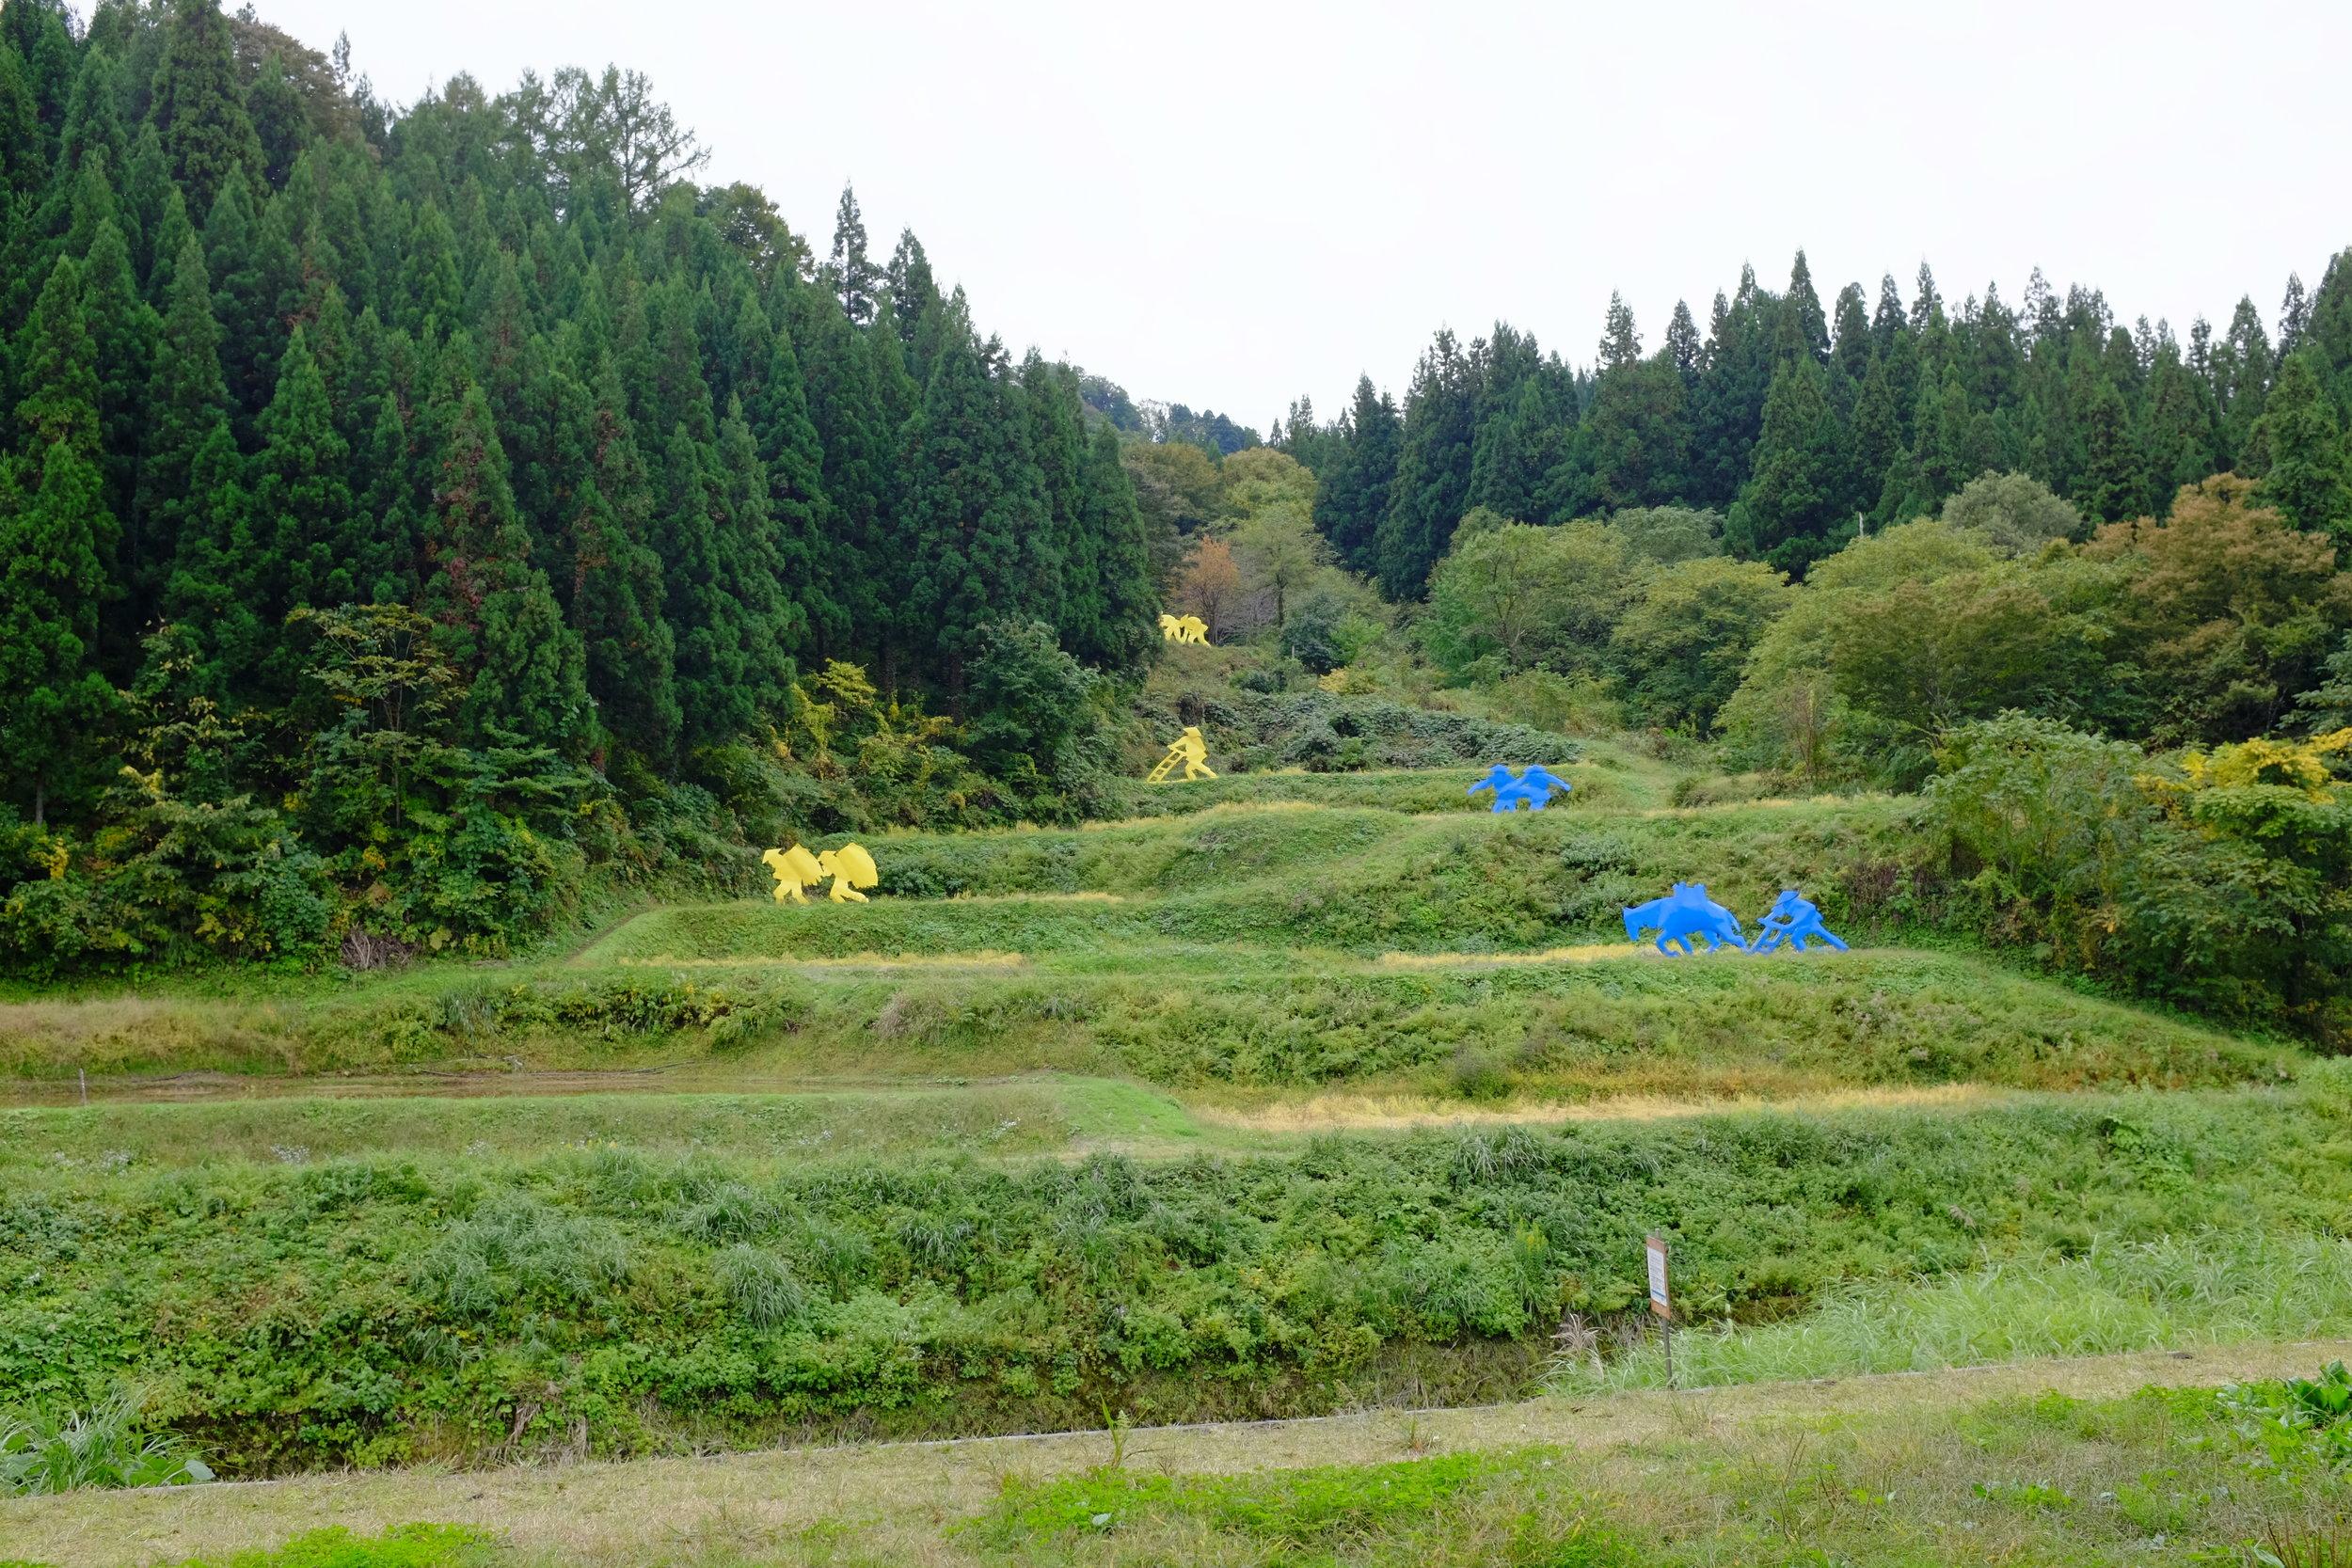 The Rice Field, by Ilya and Emilia Kabakov, at the Echigo-Tsumari Art Field.